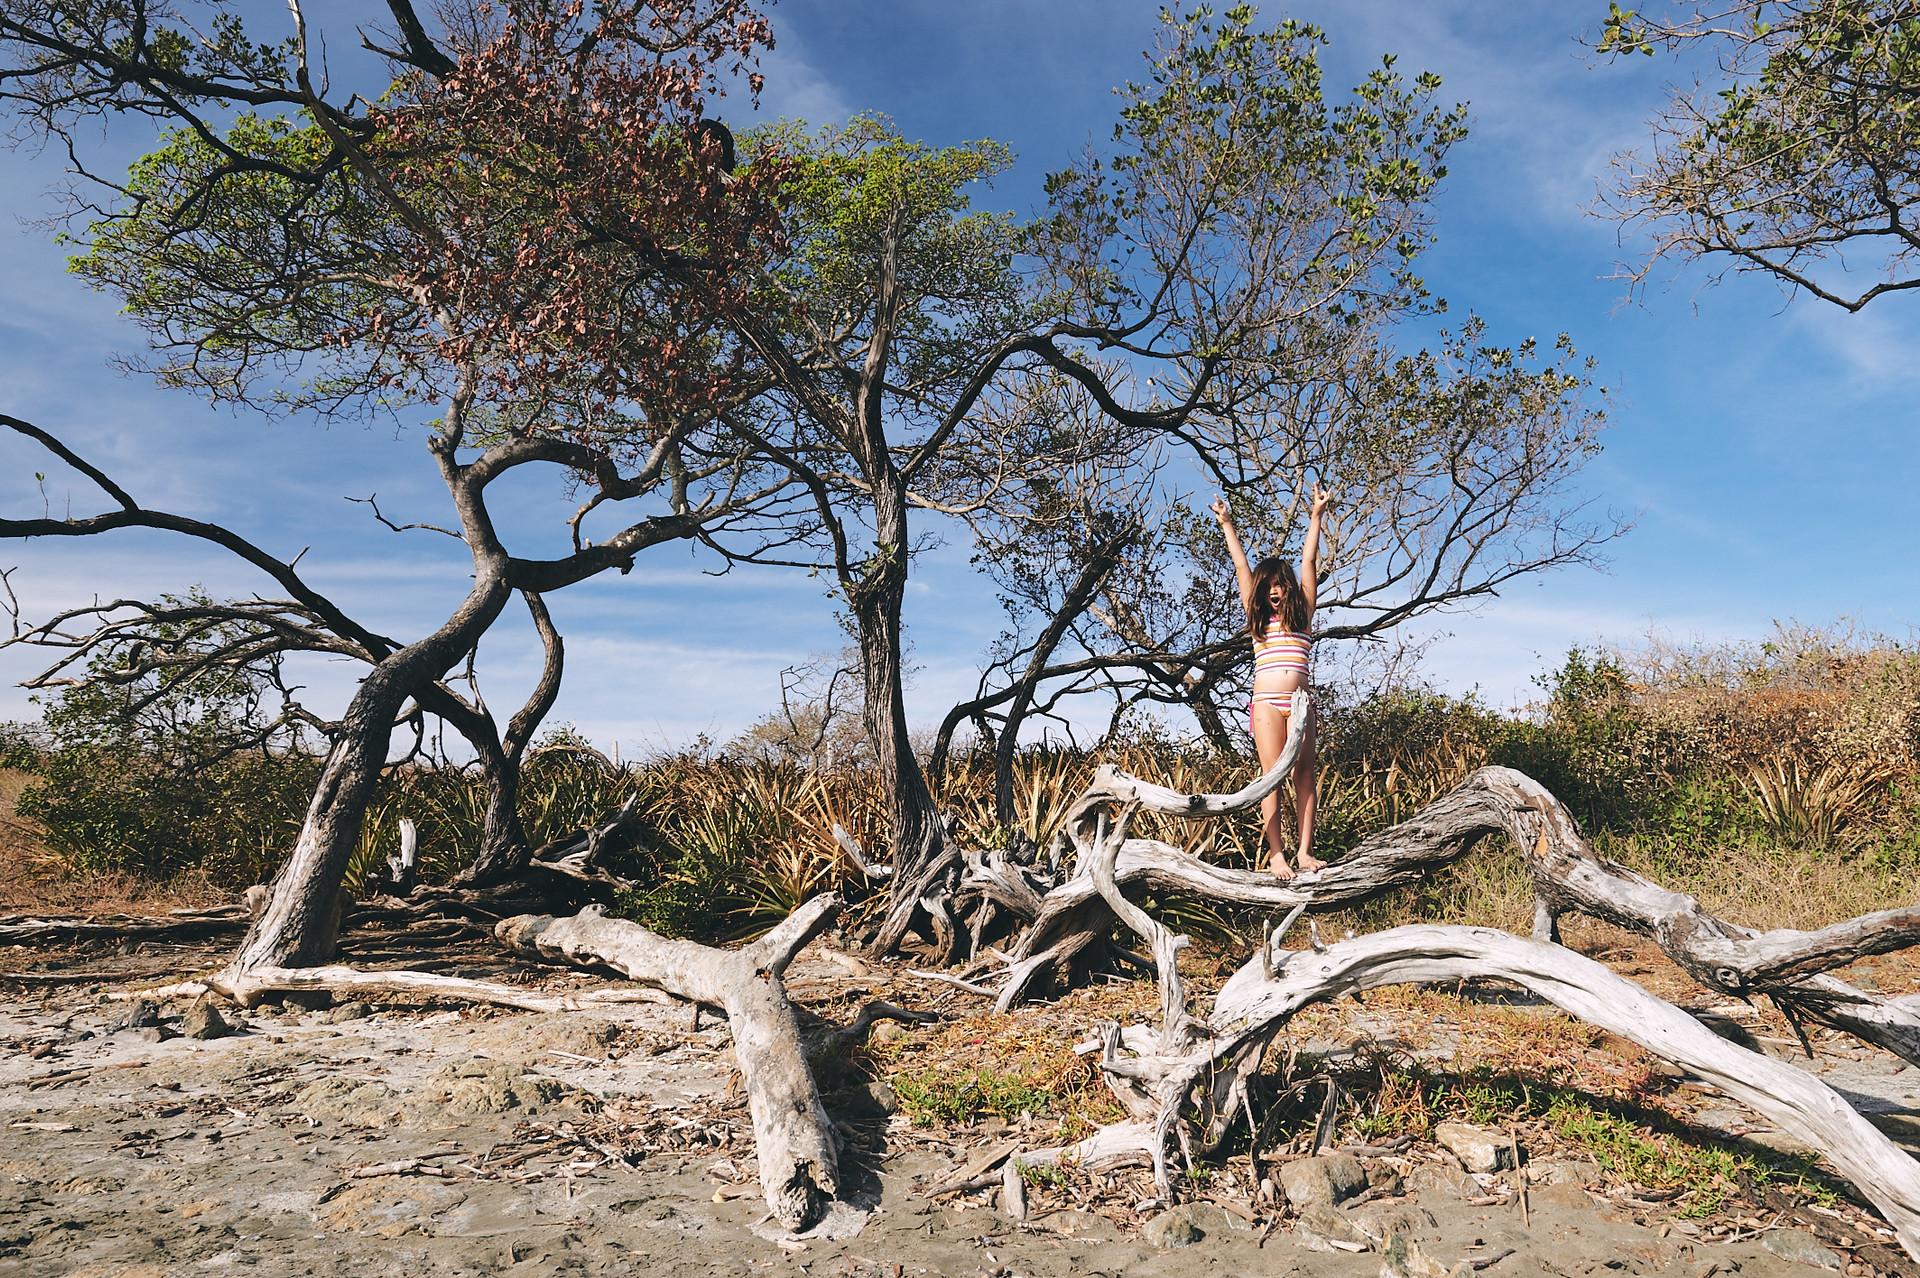 Playa Negra Costa Rica